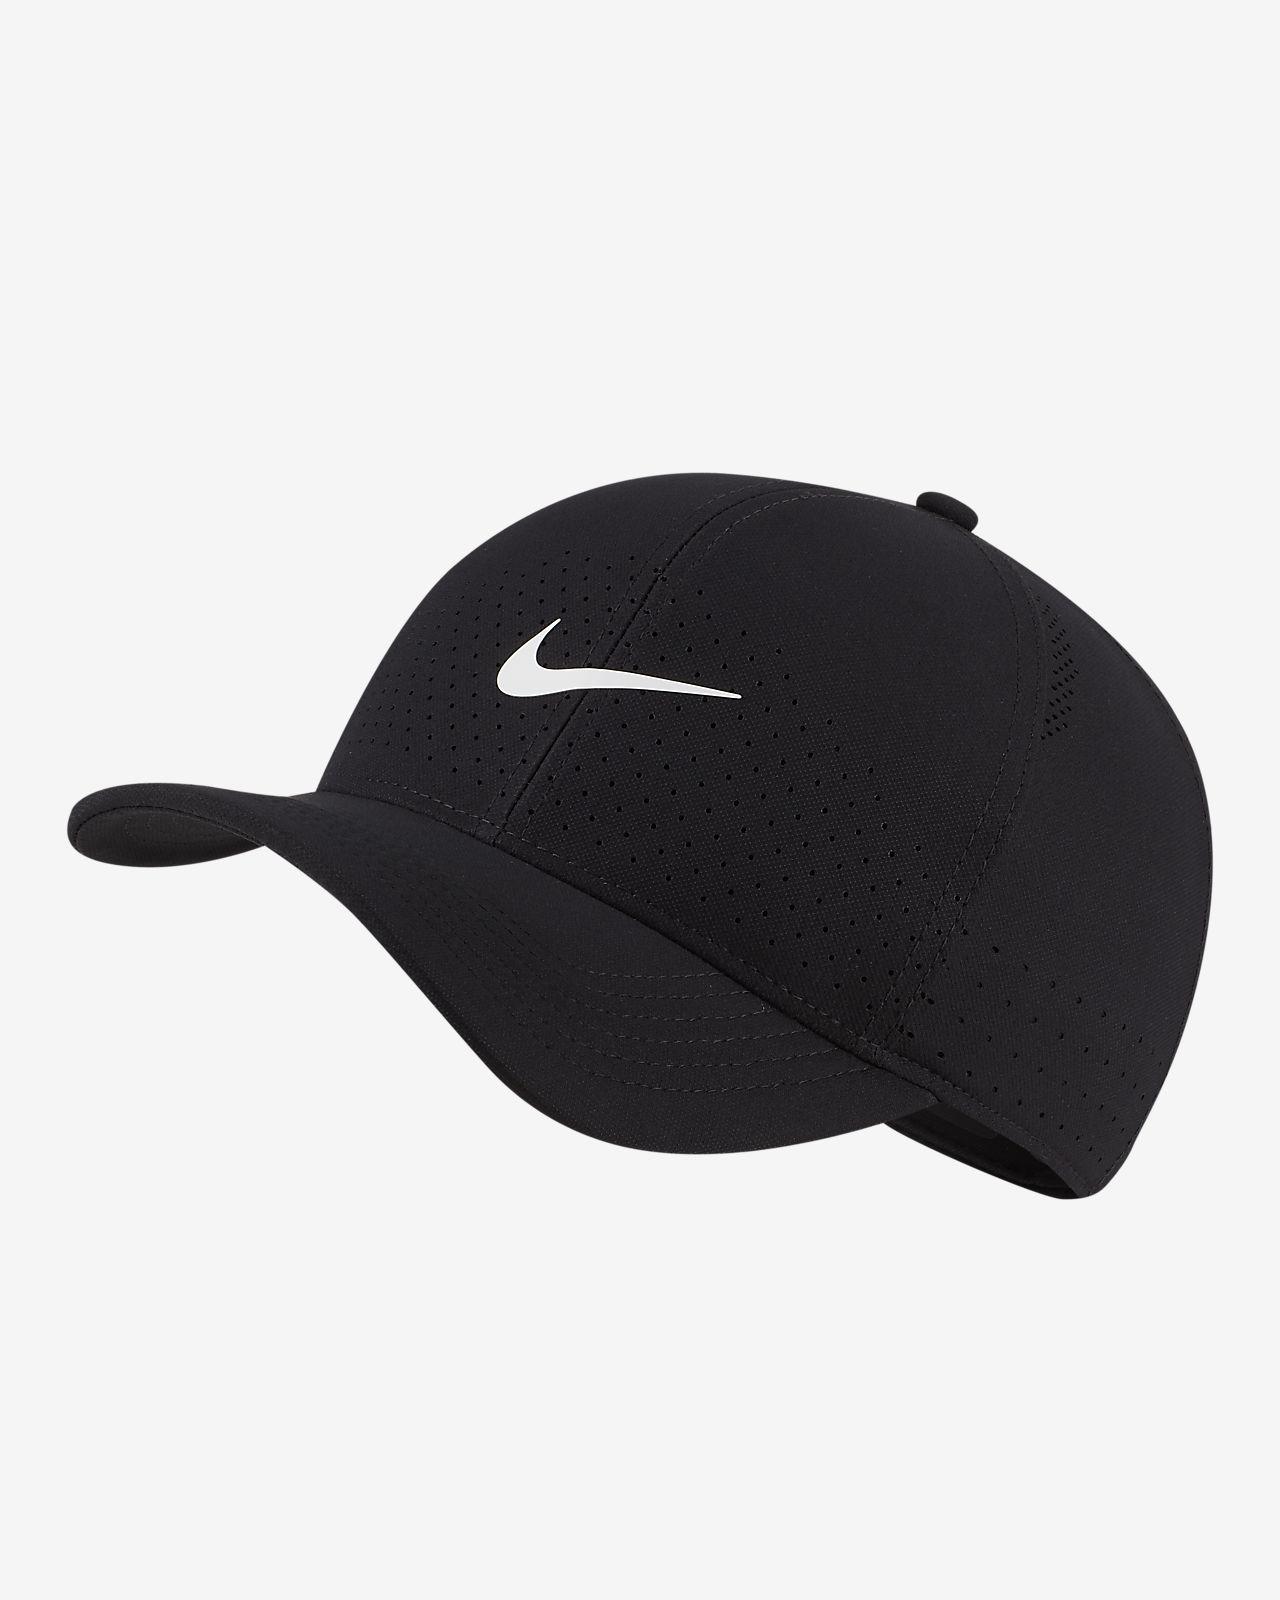 ffef6264f6f75 Nike AeroBill Classic 99 Hat. Nike.com